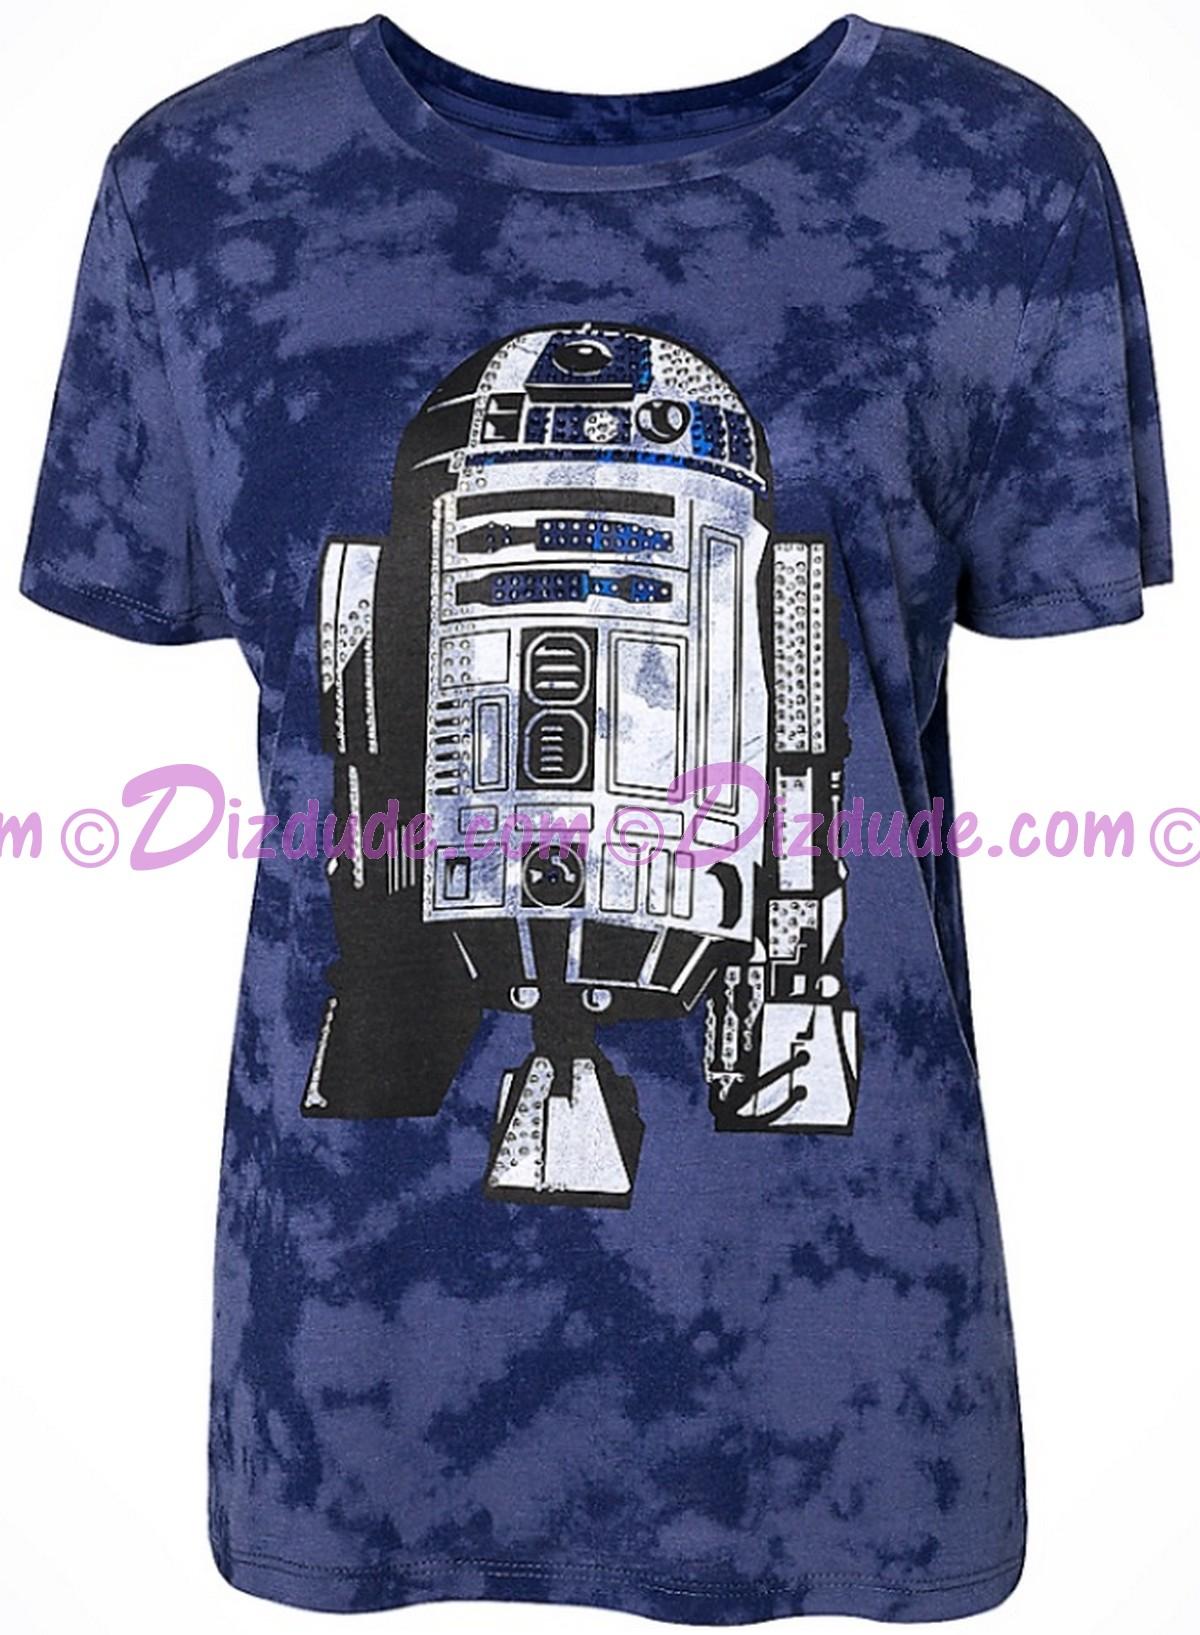 Disney Star Wars R2-D2 Bling Adult T-shirt (Tee, Tshirt or T shirt) © Dizdude.com